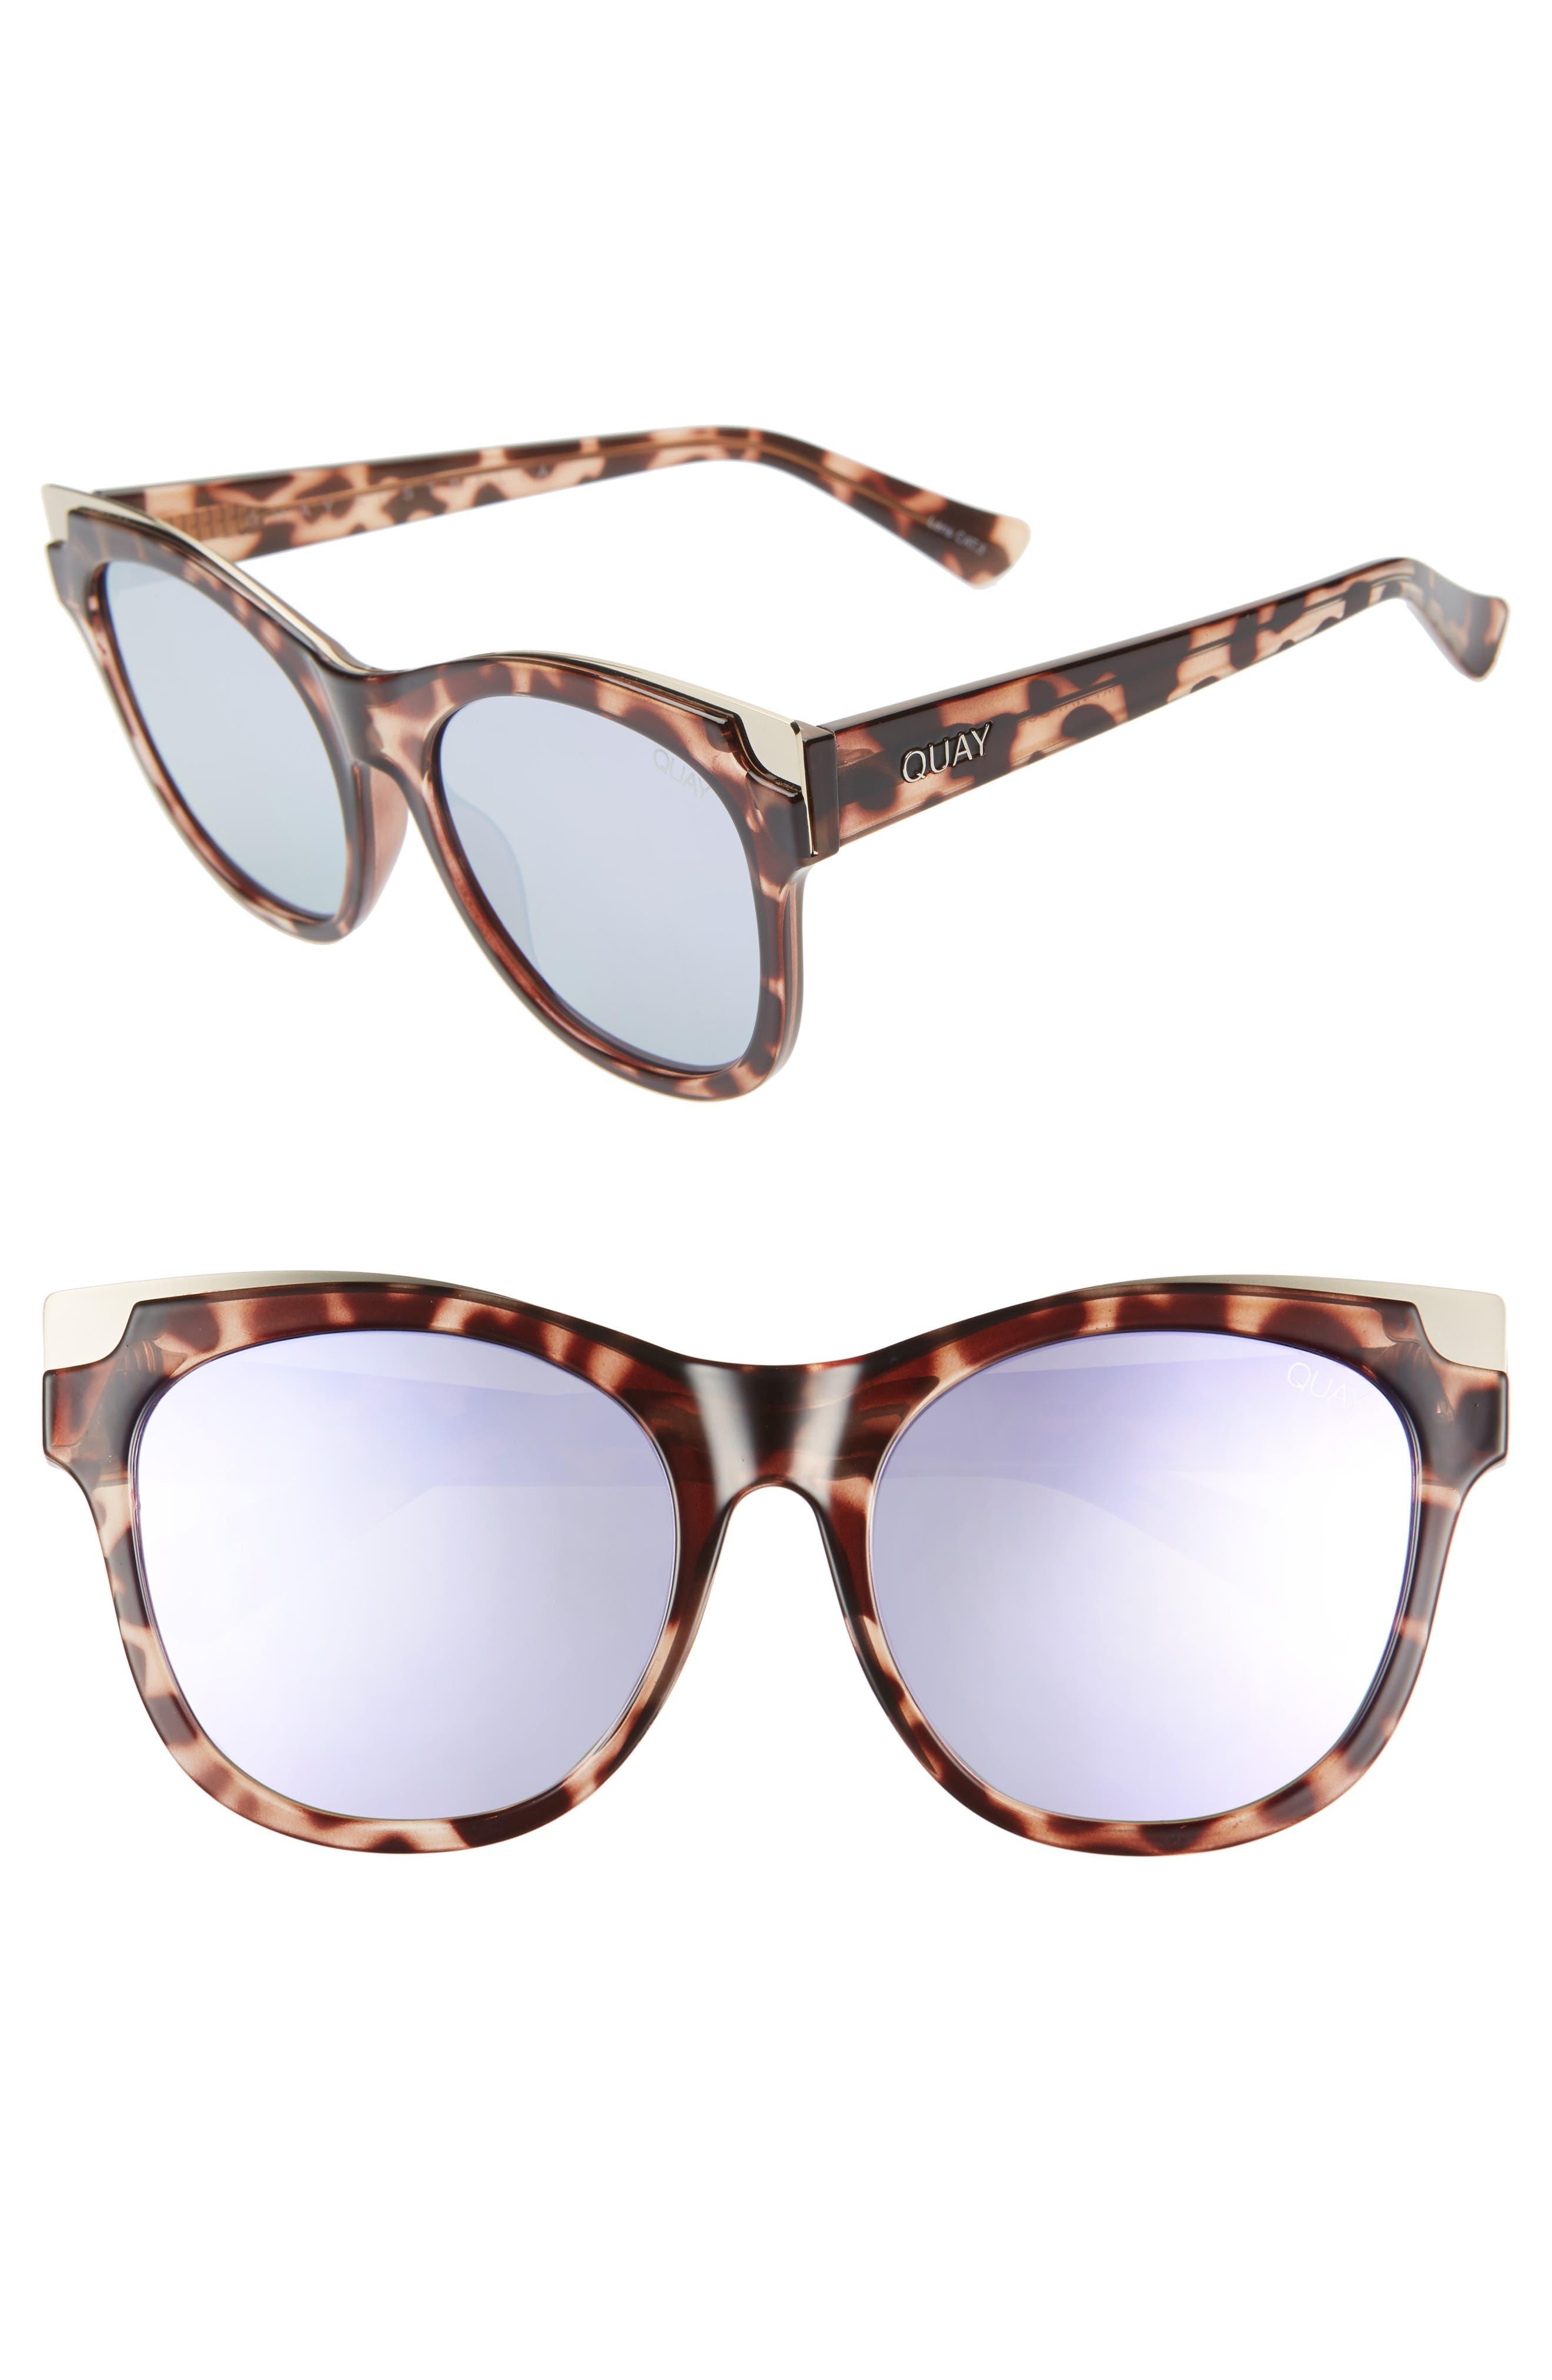 48627520d0dcc Women s Quay Australia Cat-Eye Sunglasses